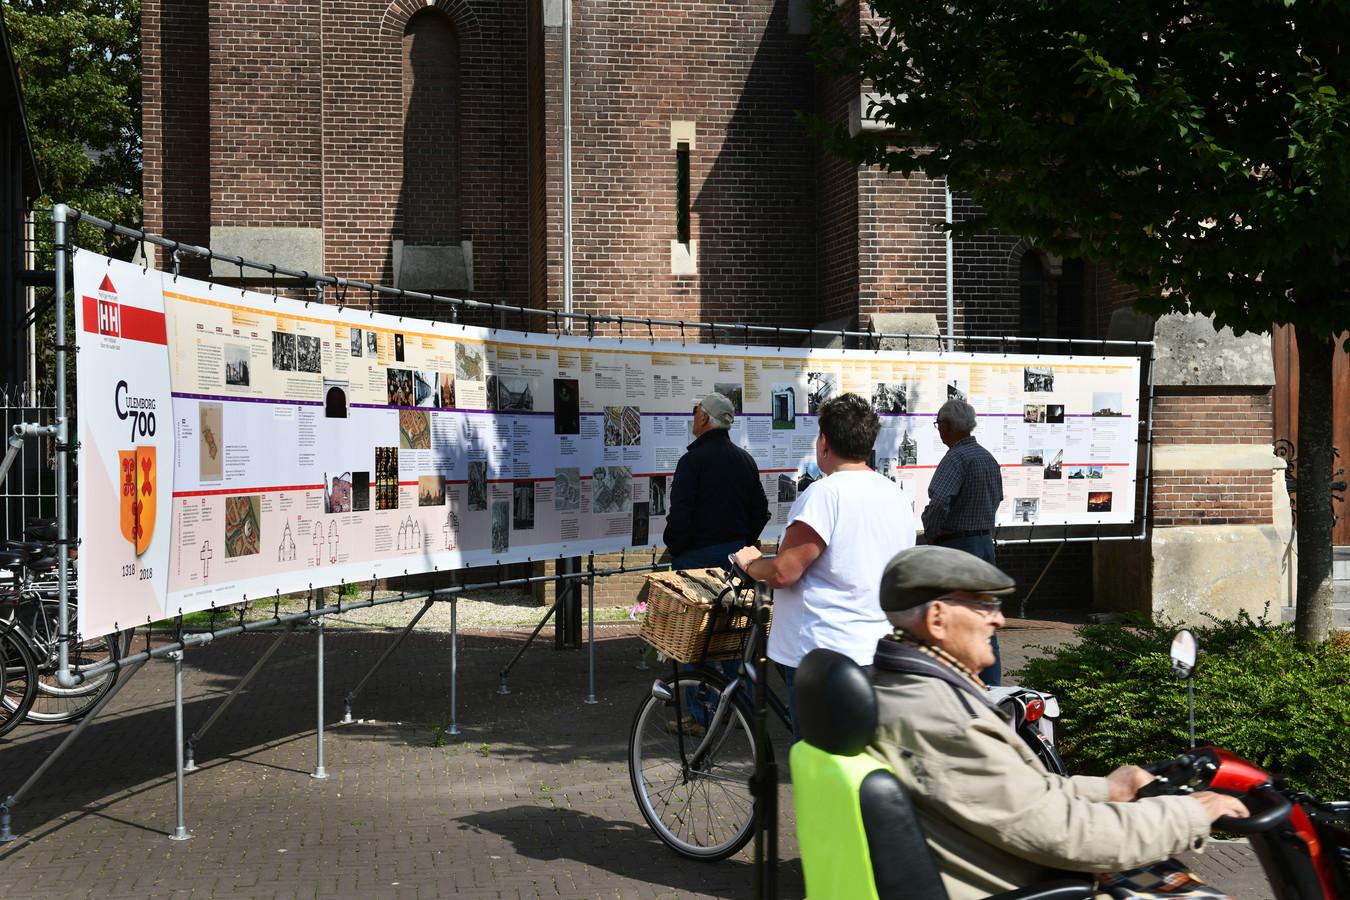 Een spandoek van 10 meter vol kerkhistorie is terug na eerdere diefstal.